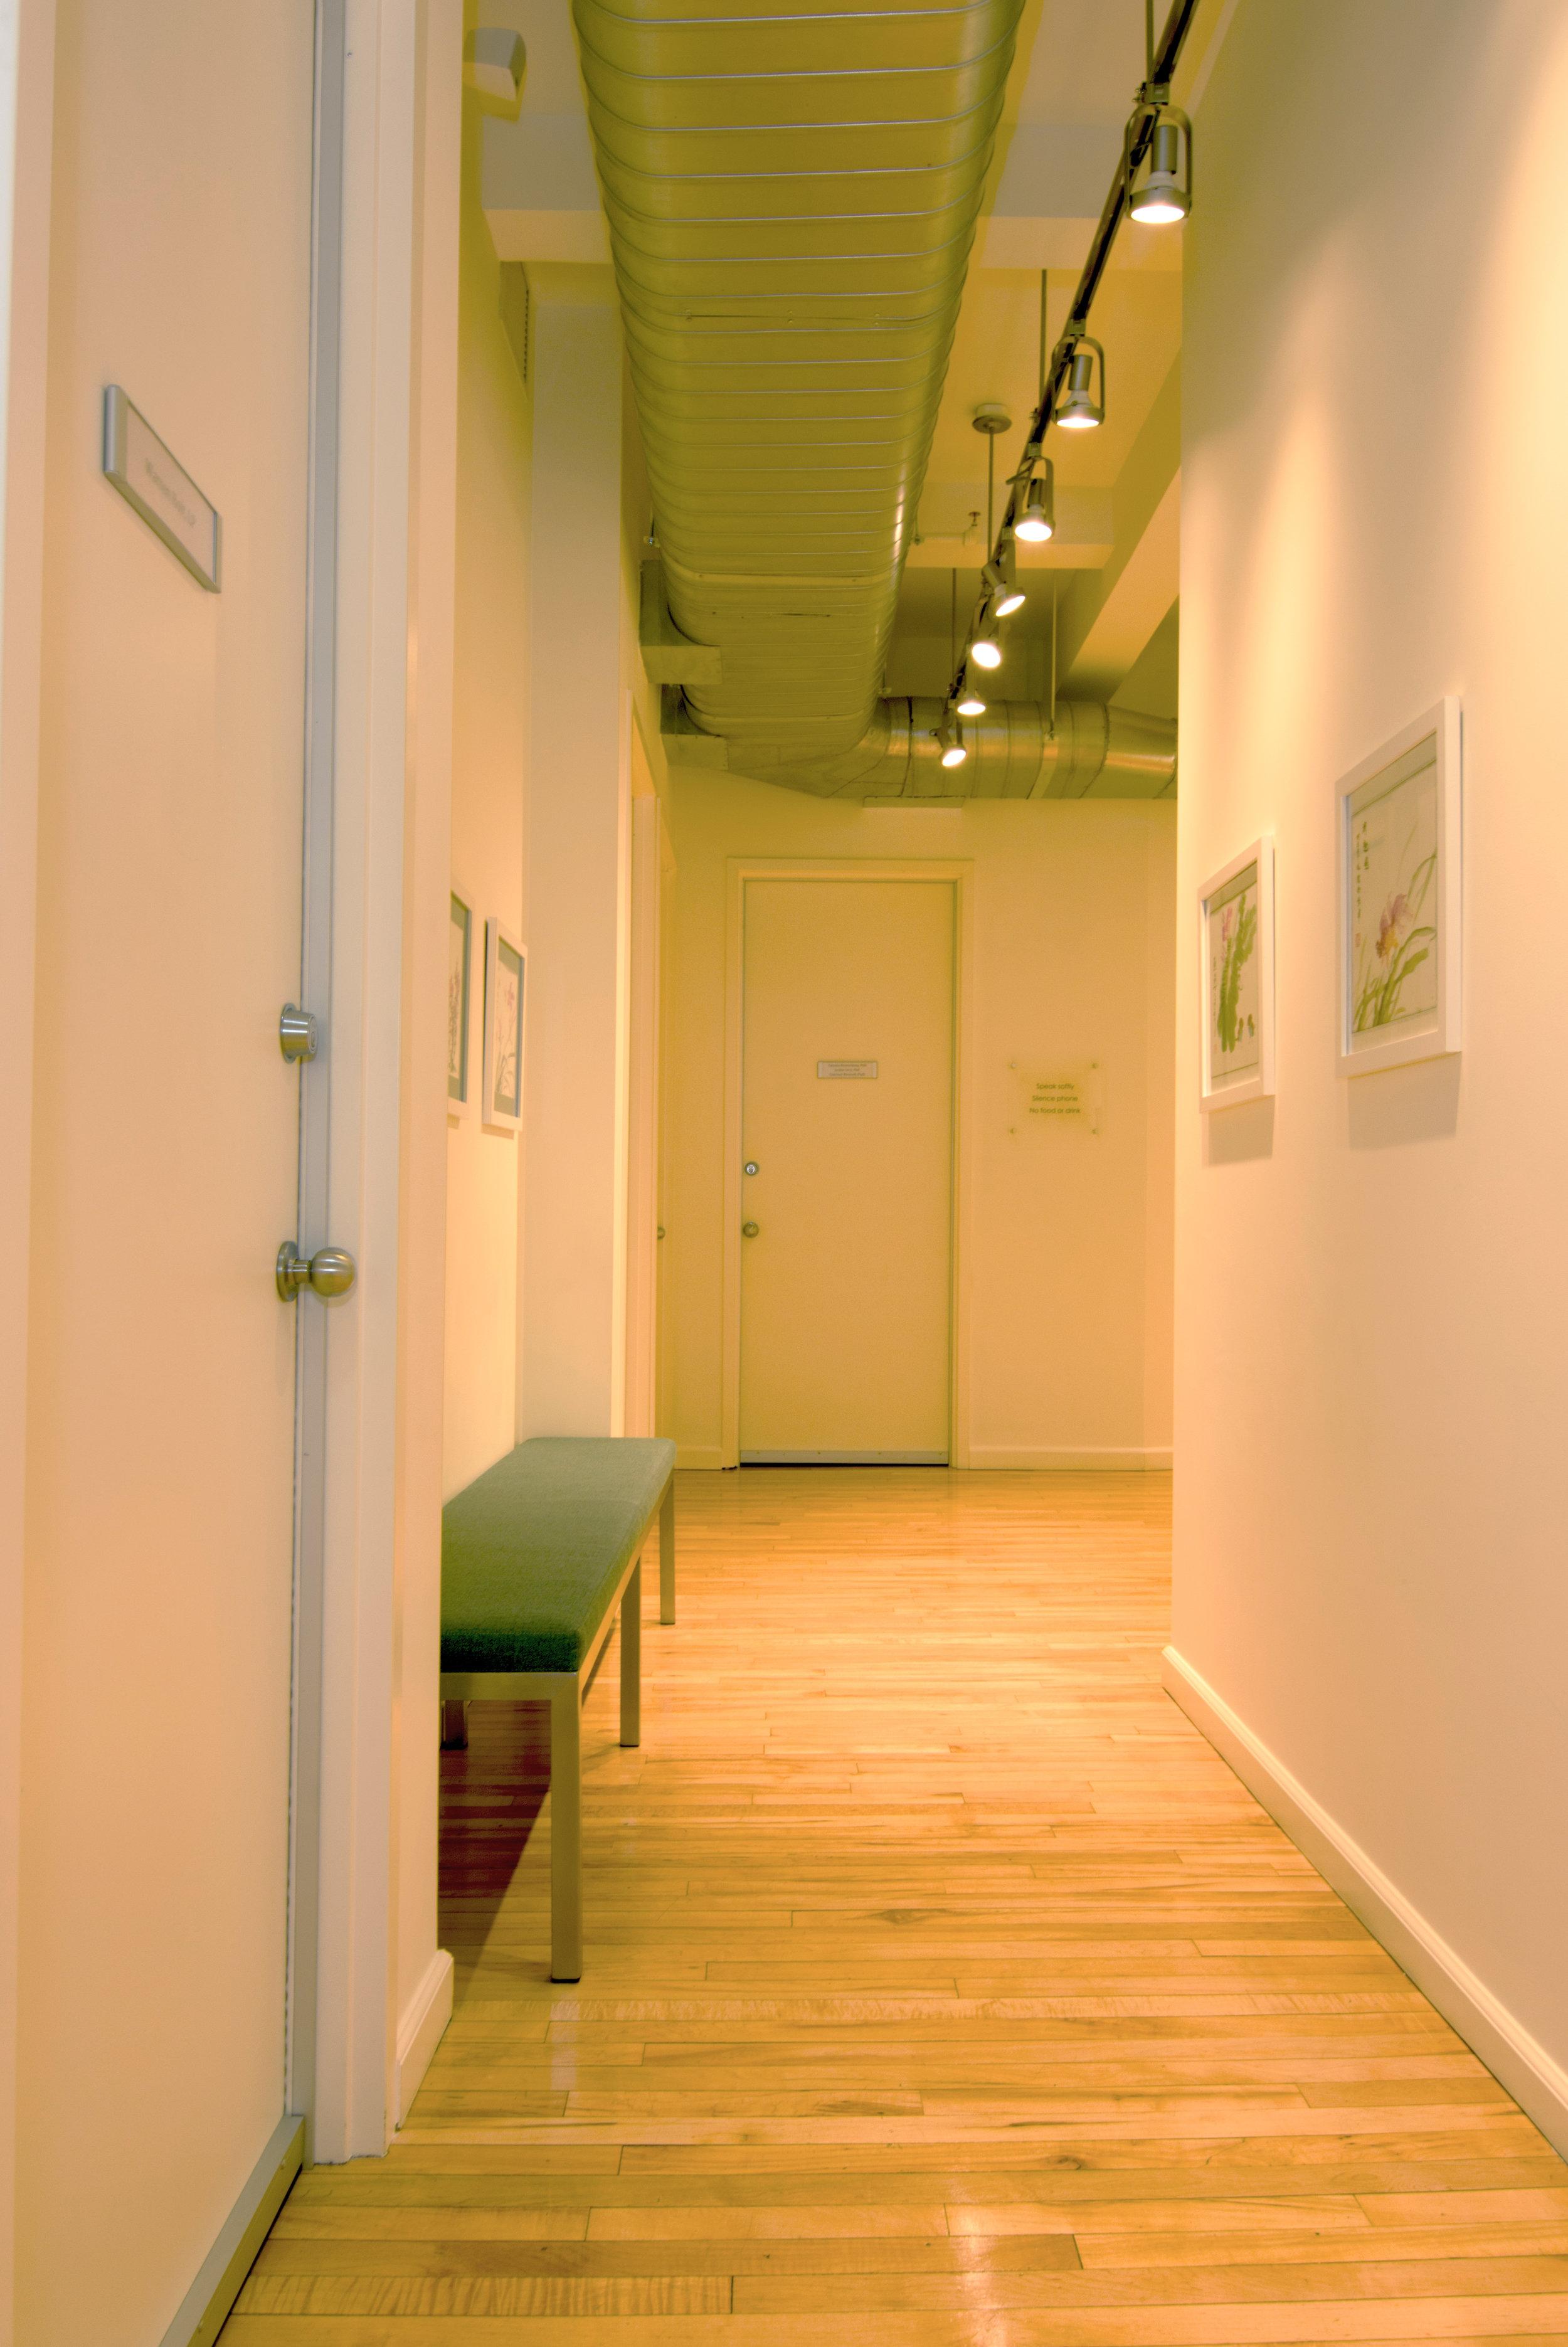 serene-offices-therapy-office-flatiron-21st-street-waiting-room-hallway.jpg